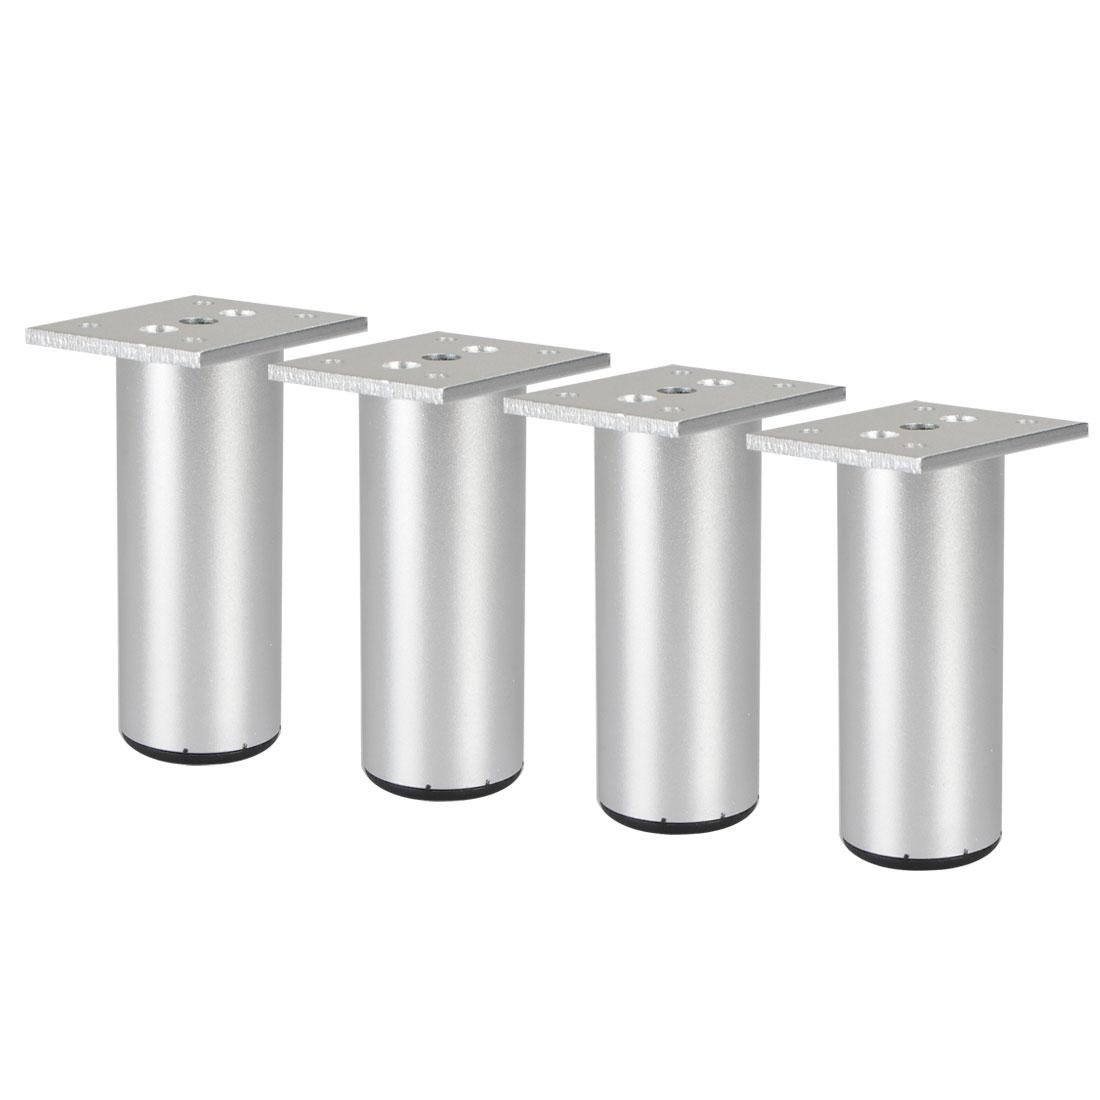 "4"" Furniture Legs Aluminium Alloy Sofa Table Replacement Height Adjuster 4pcs"